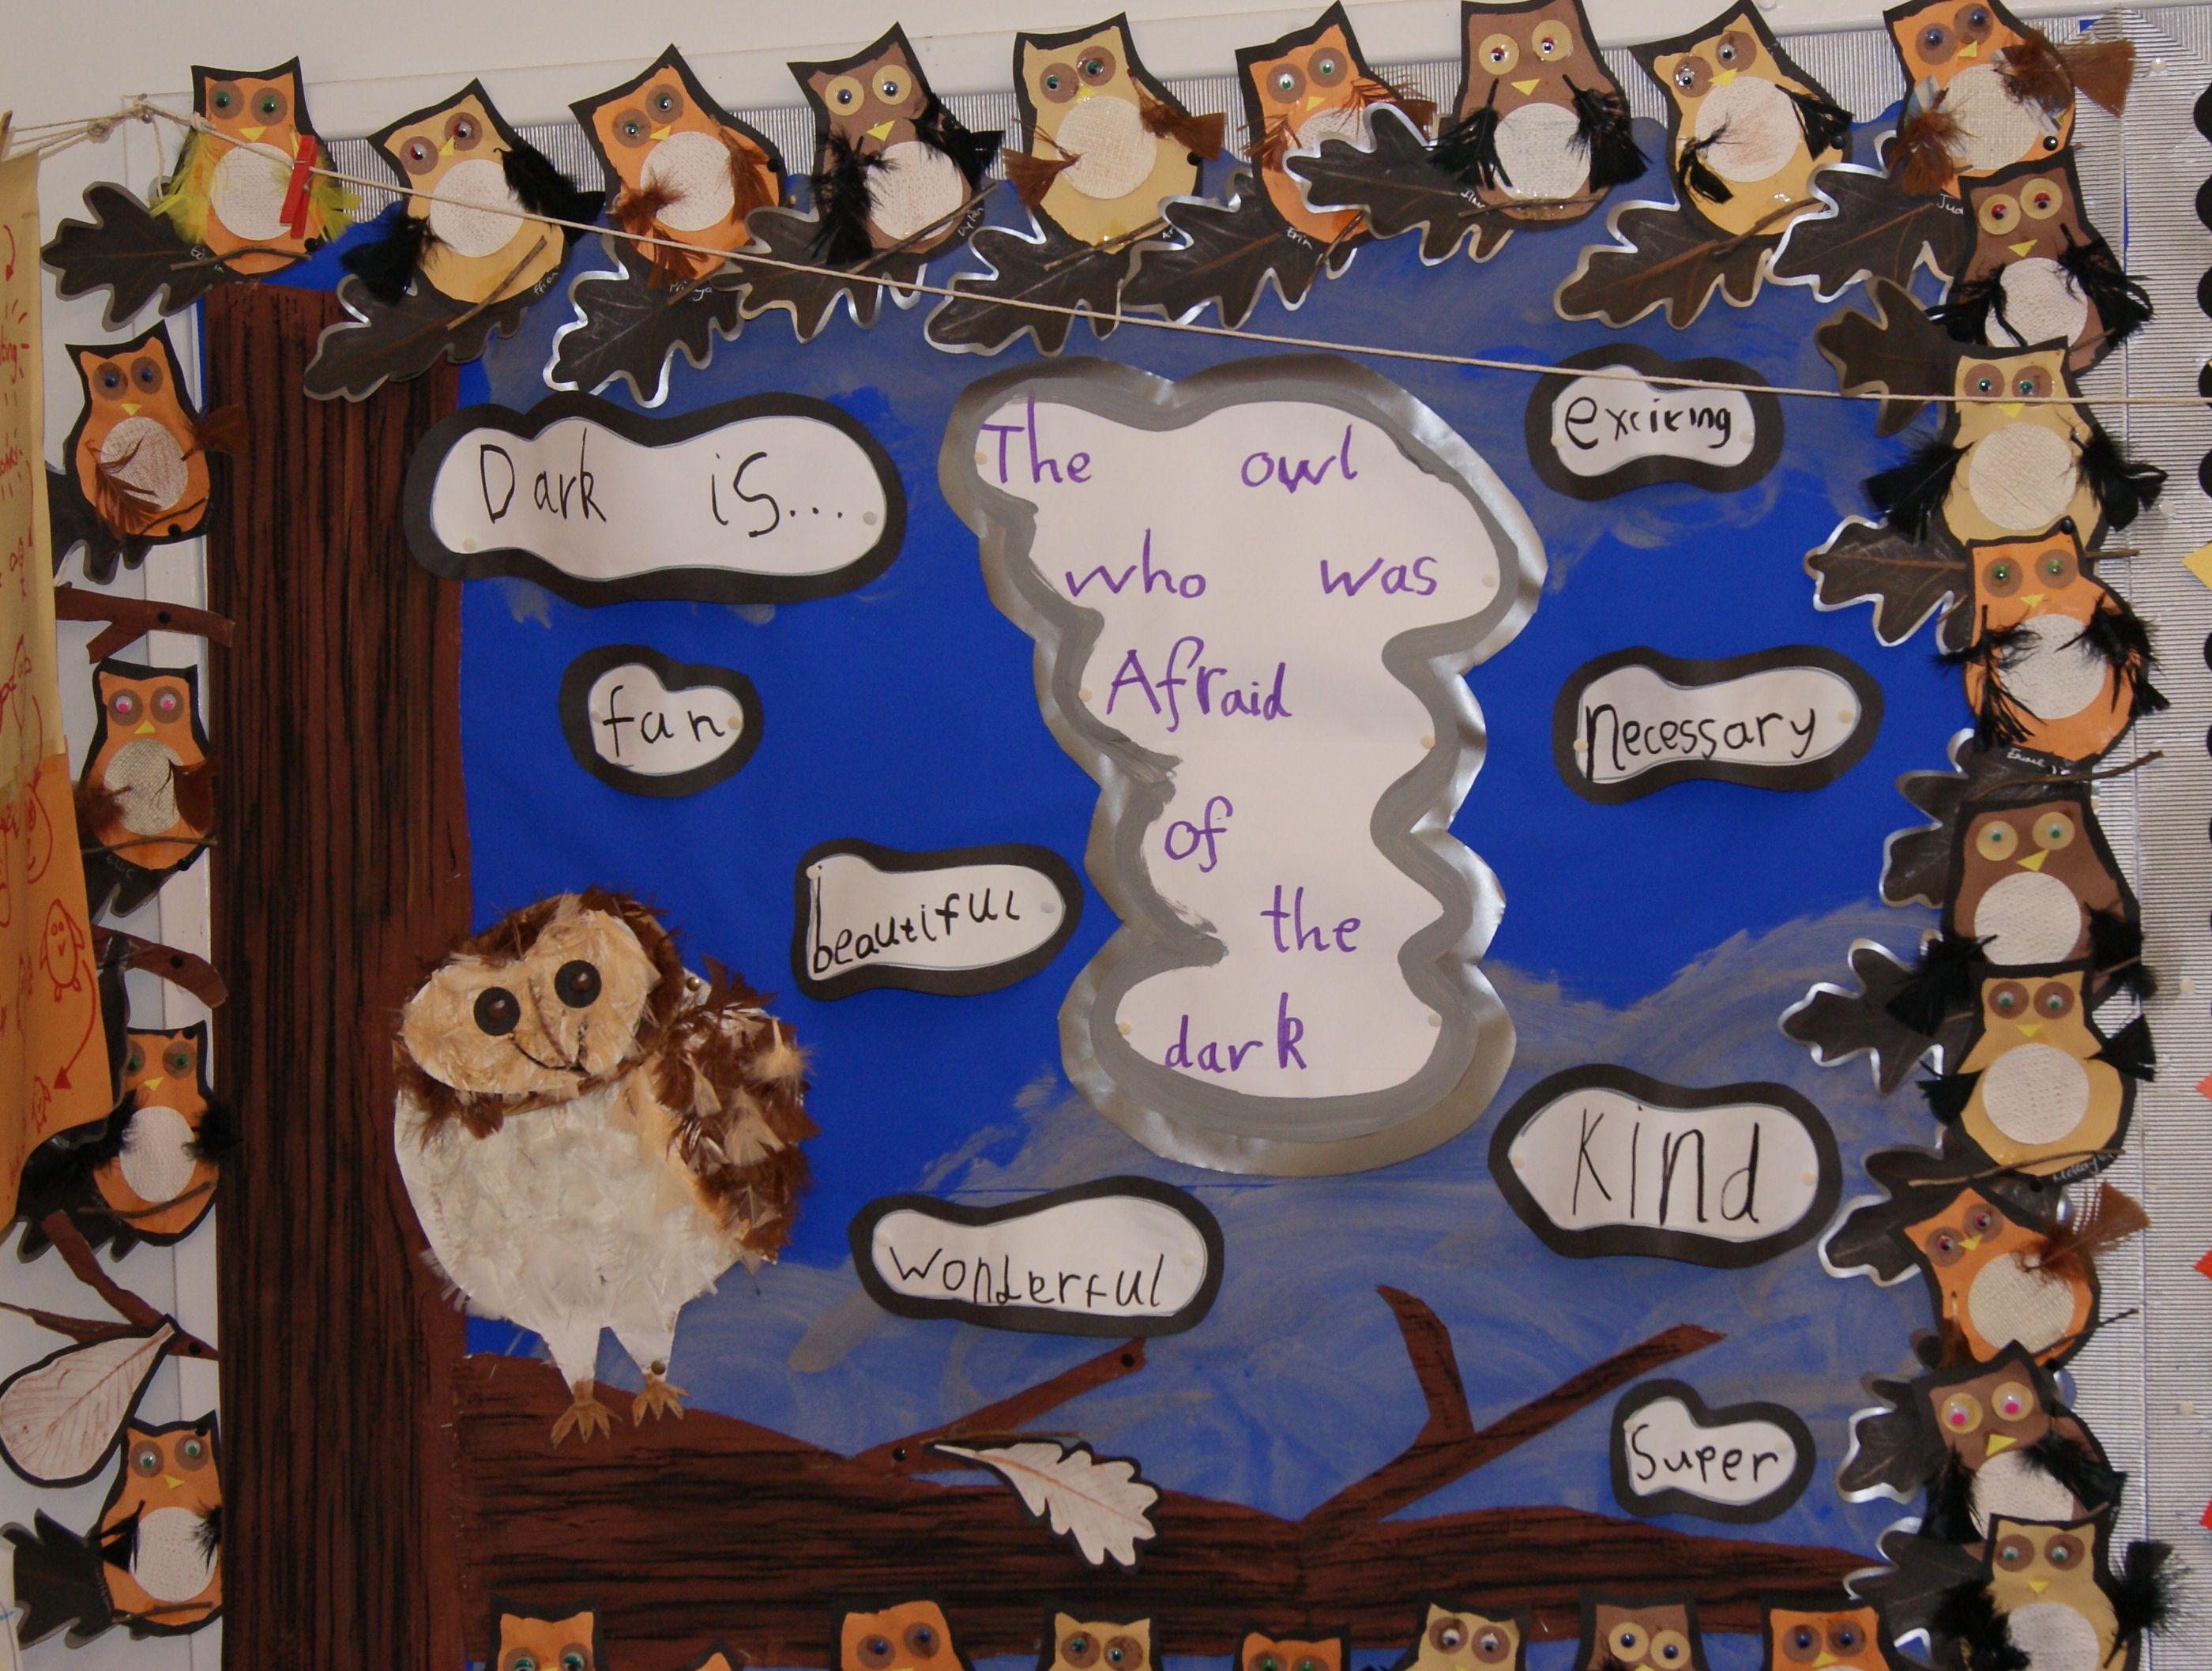 The Owl Who Was Afraid Of The Dark School Display